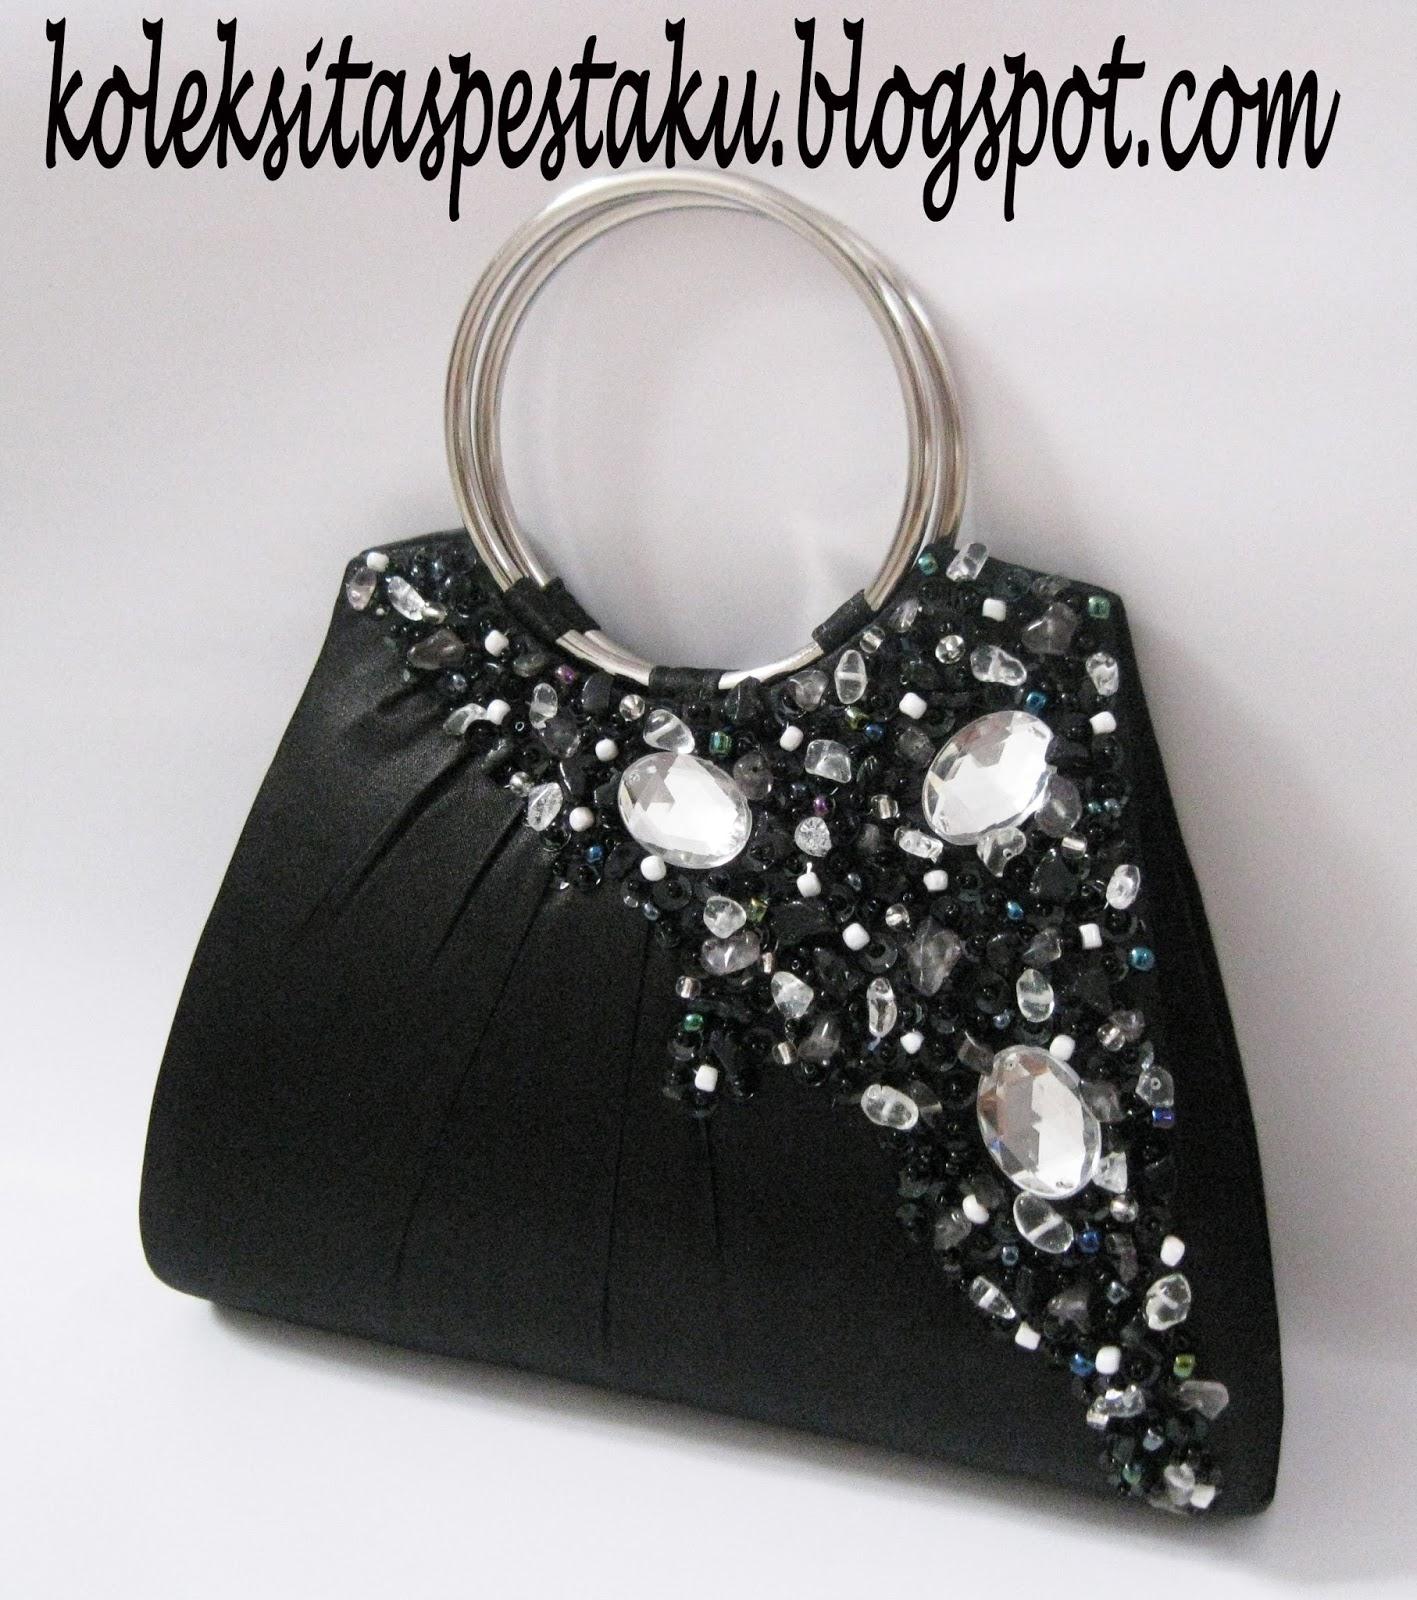 Tas Pesta - Clutch Bag  taspestaku  Tas Pesta atau Dompet Warna ... 1b9438e183